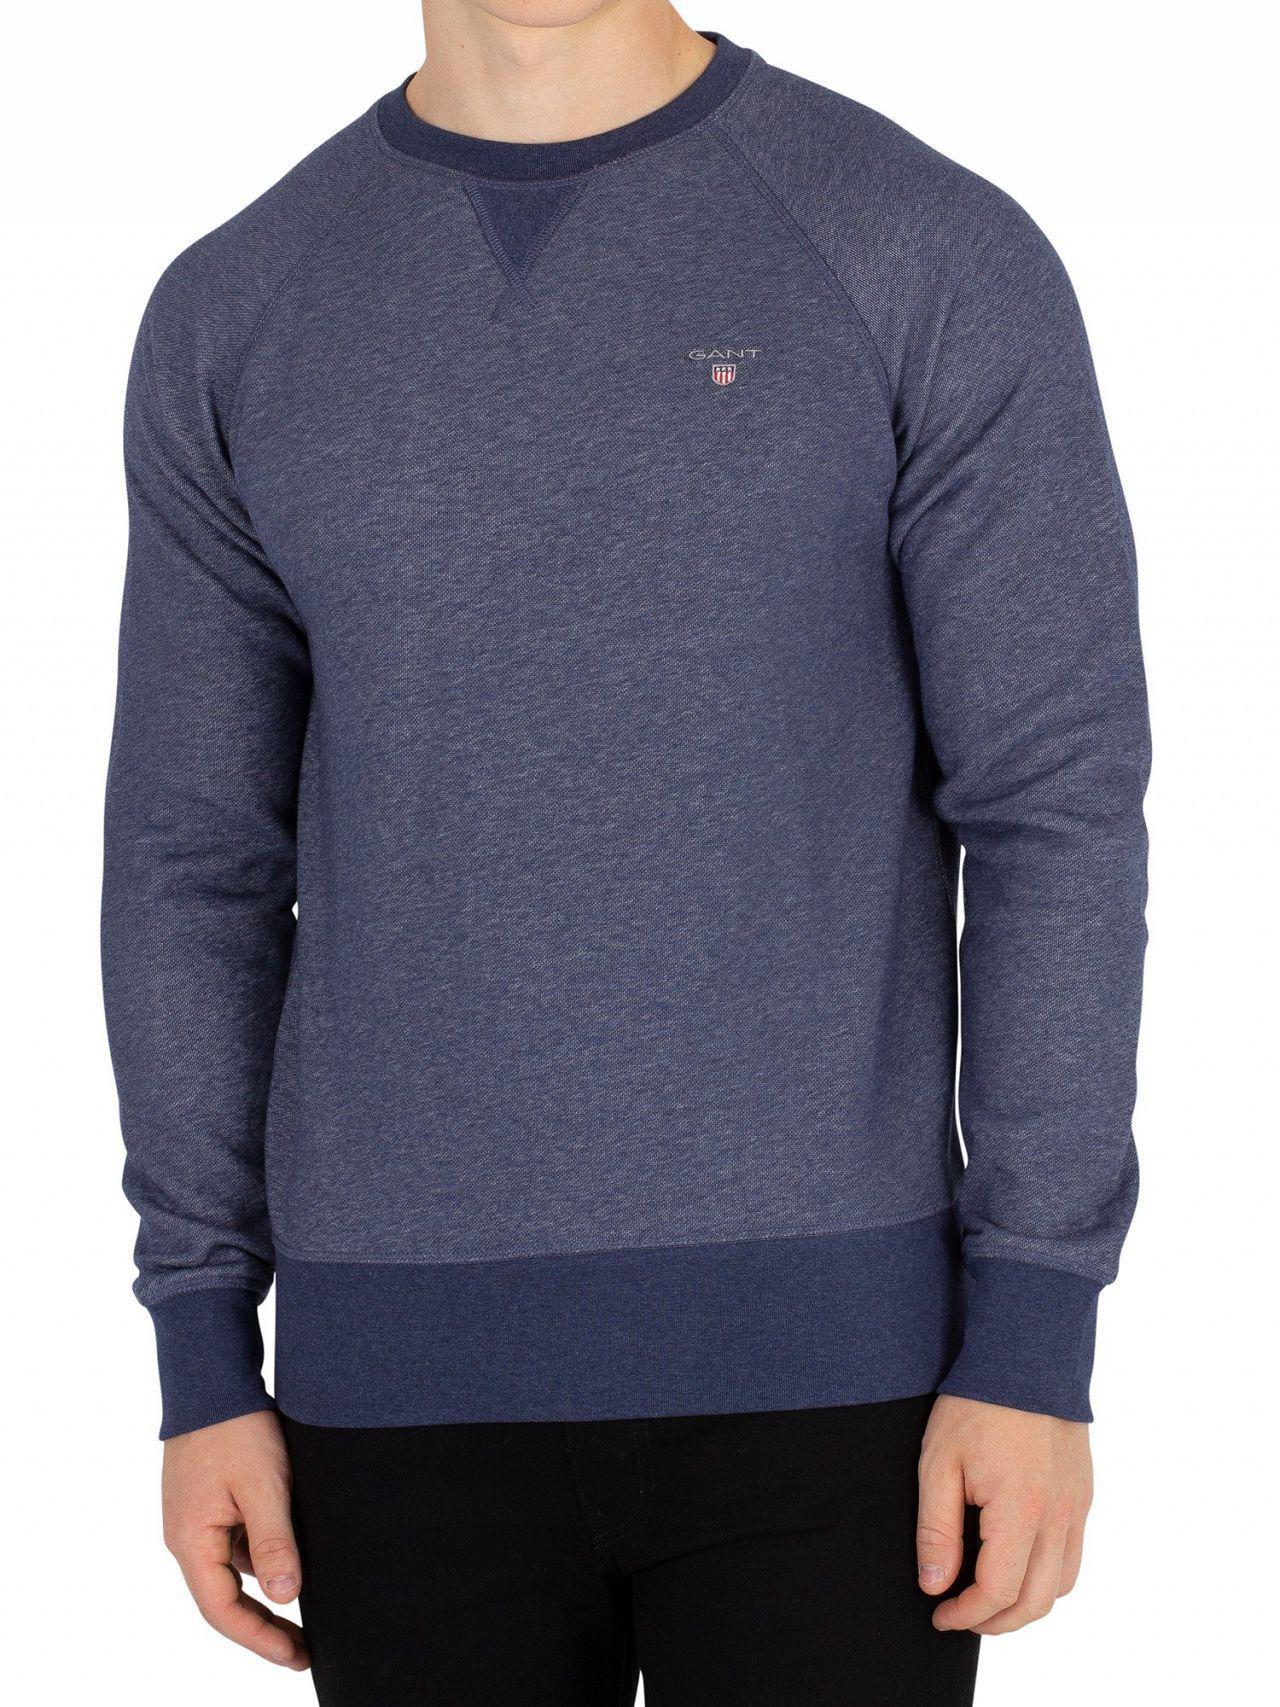 cf7db3e47b Gant - Dark Jeans Blue Melange Original Sweatshirt for Men - Lyst. View  fullscreen